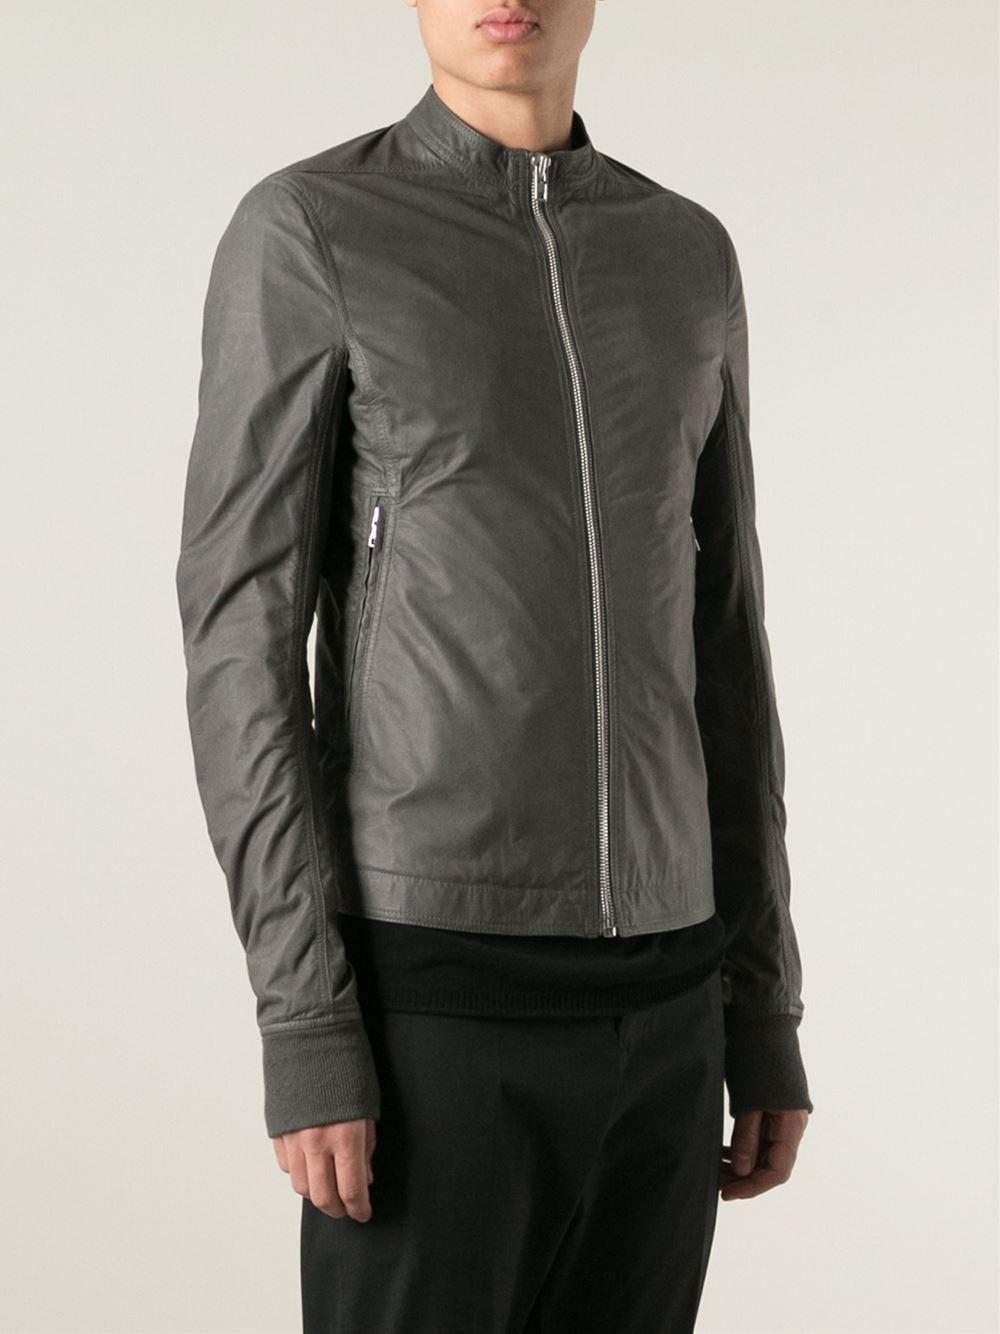 Kangaroo leather jacket